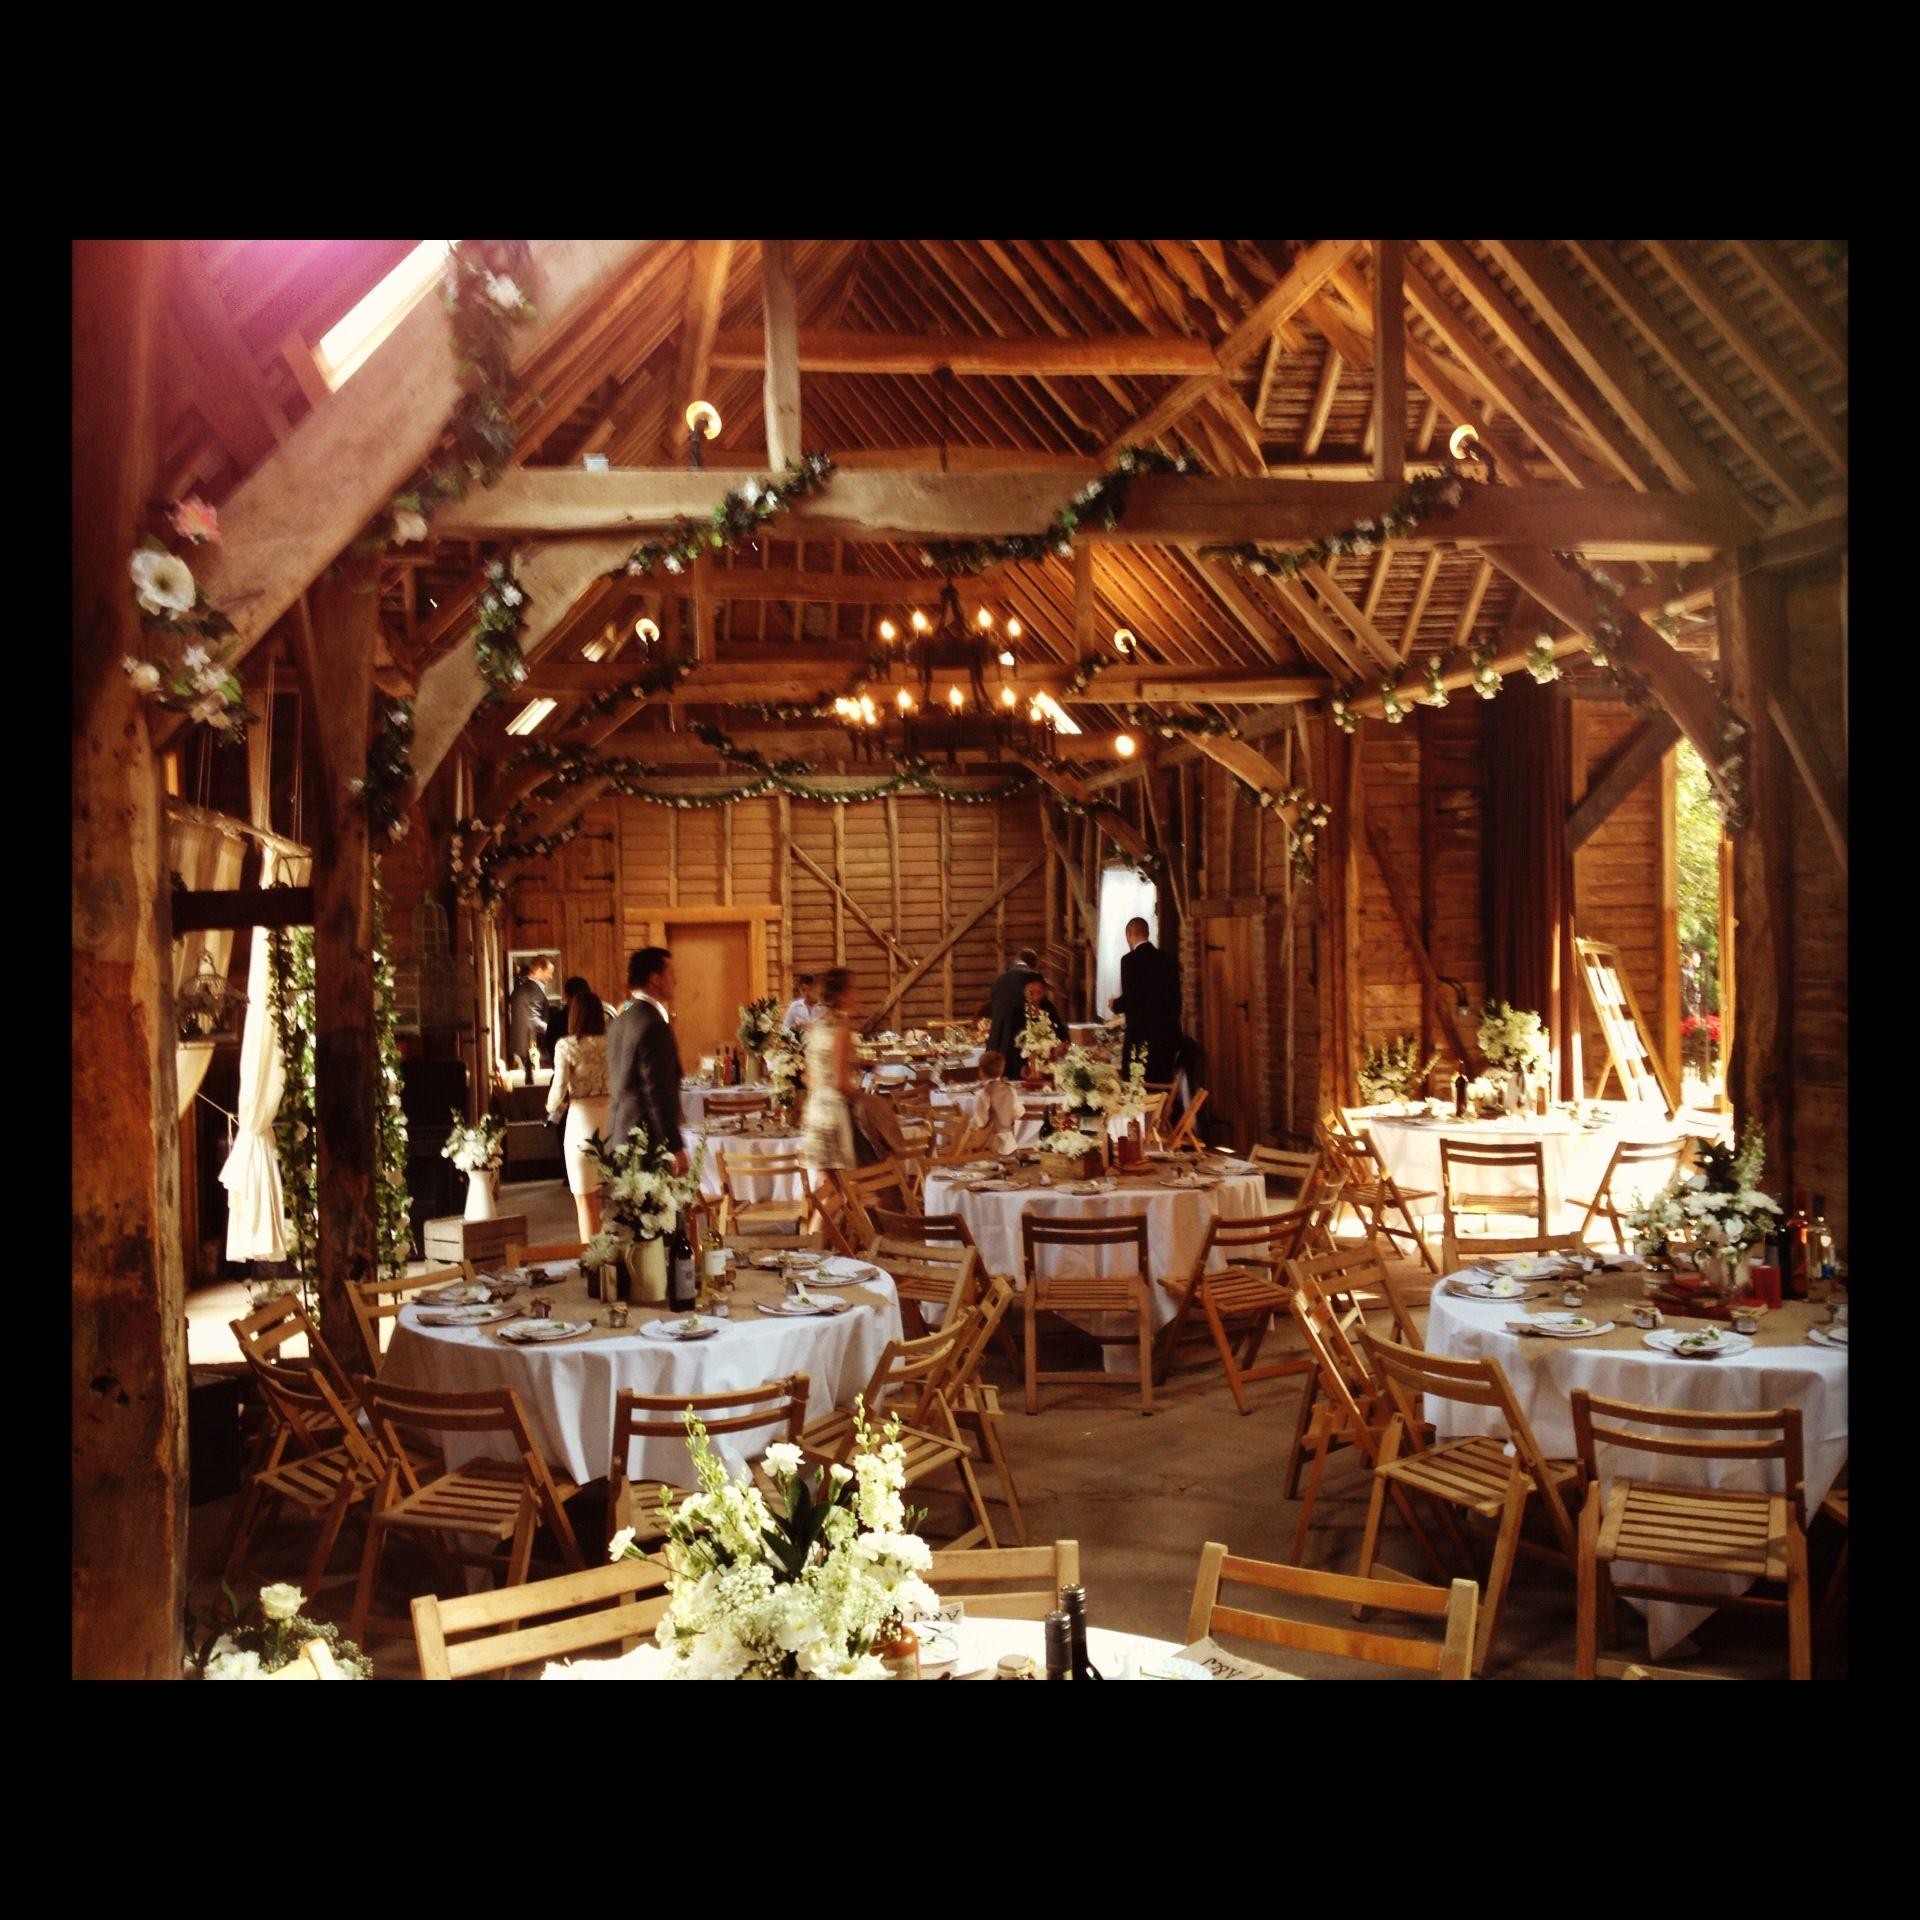 Vintage Barn Wedding Ideas: Rustic Barn Wedding Breakfast